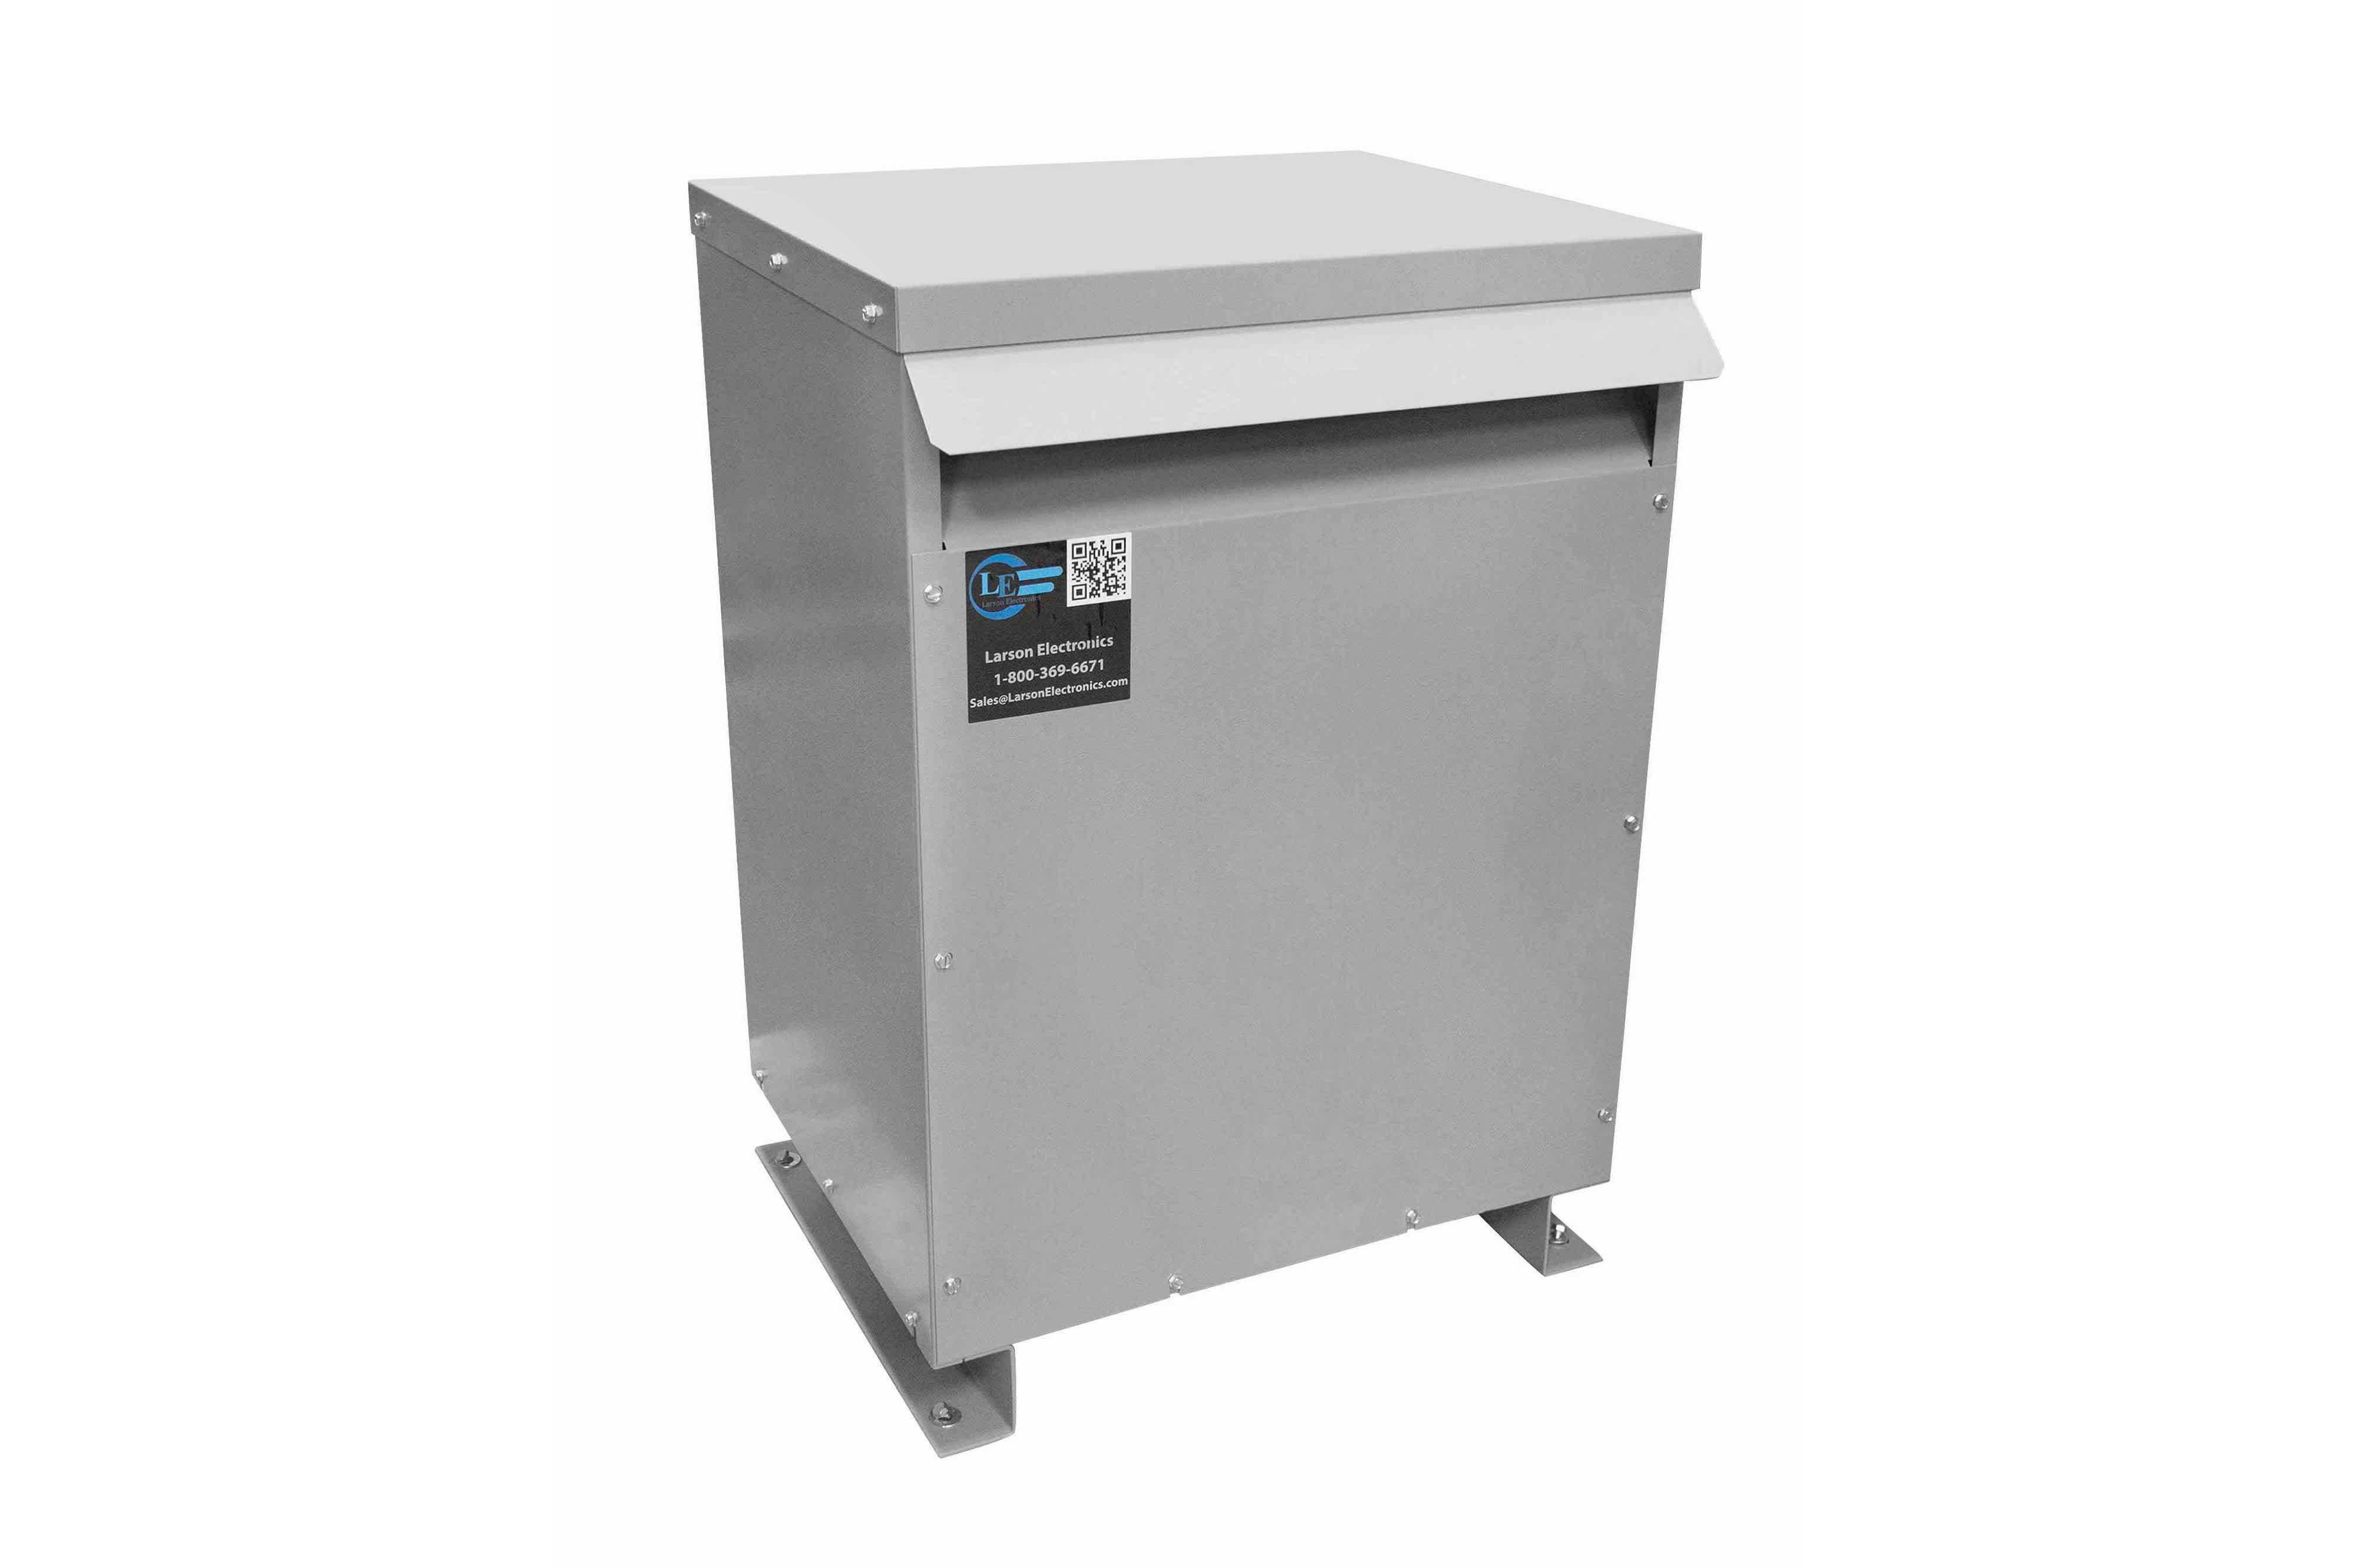 50 kVA 3PH DOE Transformer, 208V Delta Primary, 480Y/277 Wye-N Secondary, N3R, Ventilated, 60 Hz